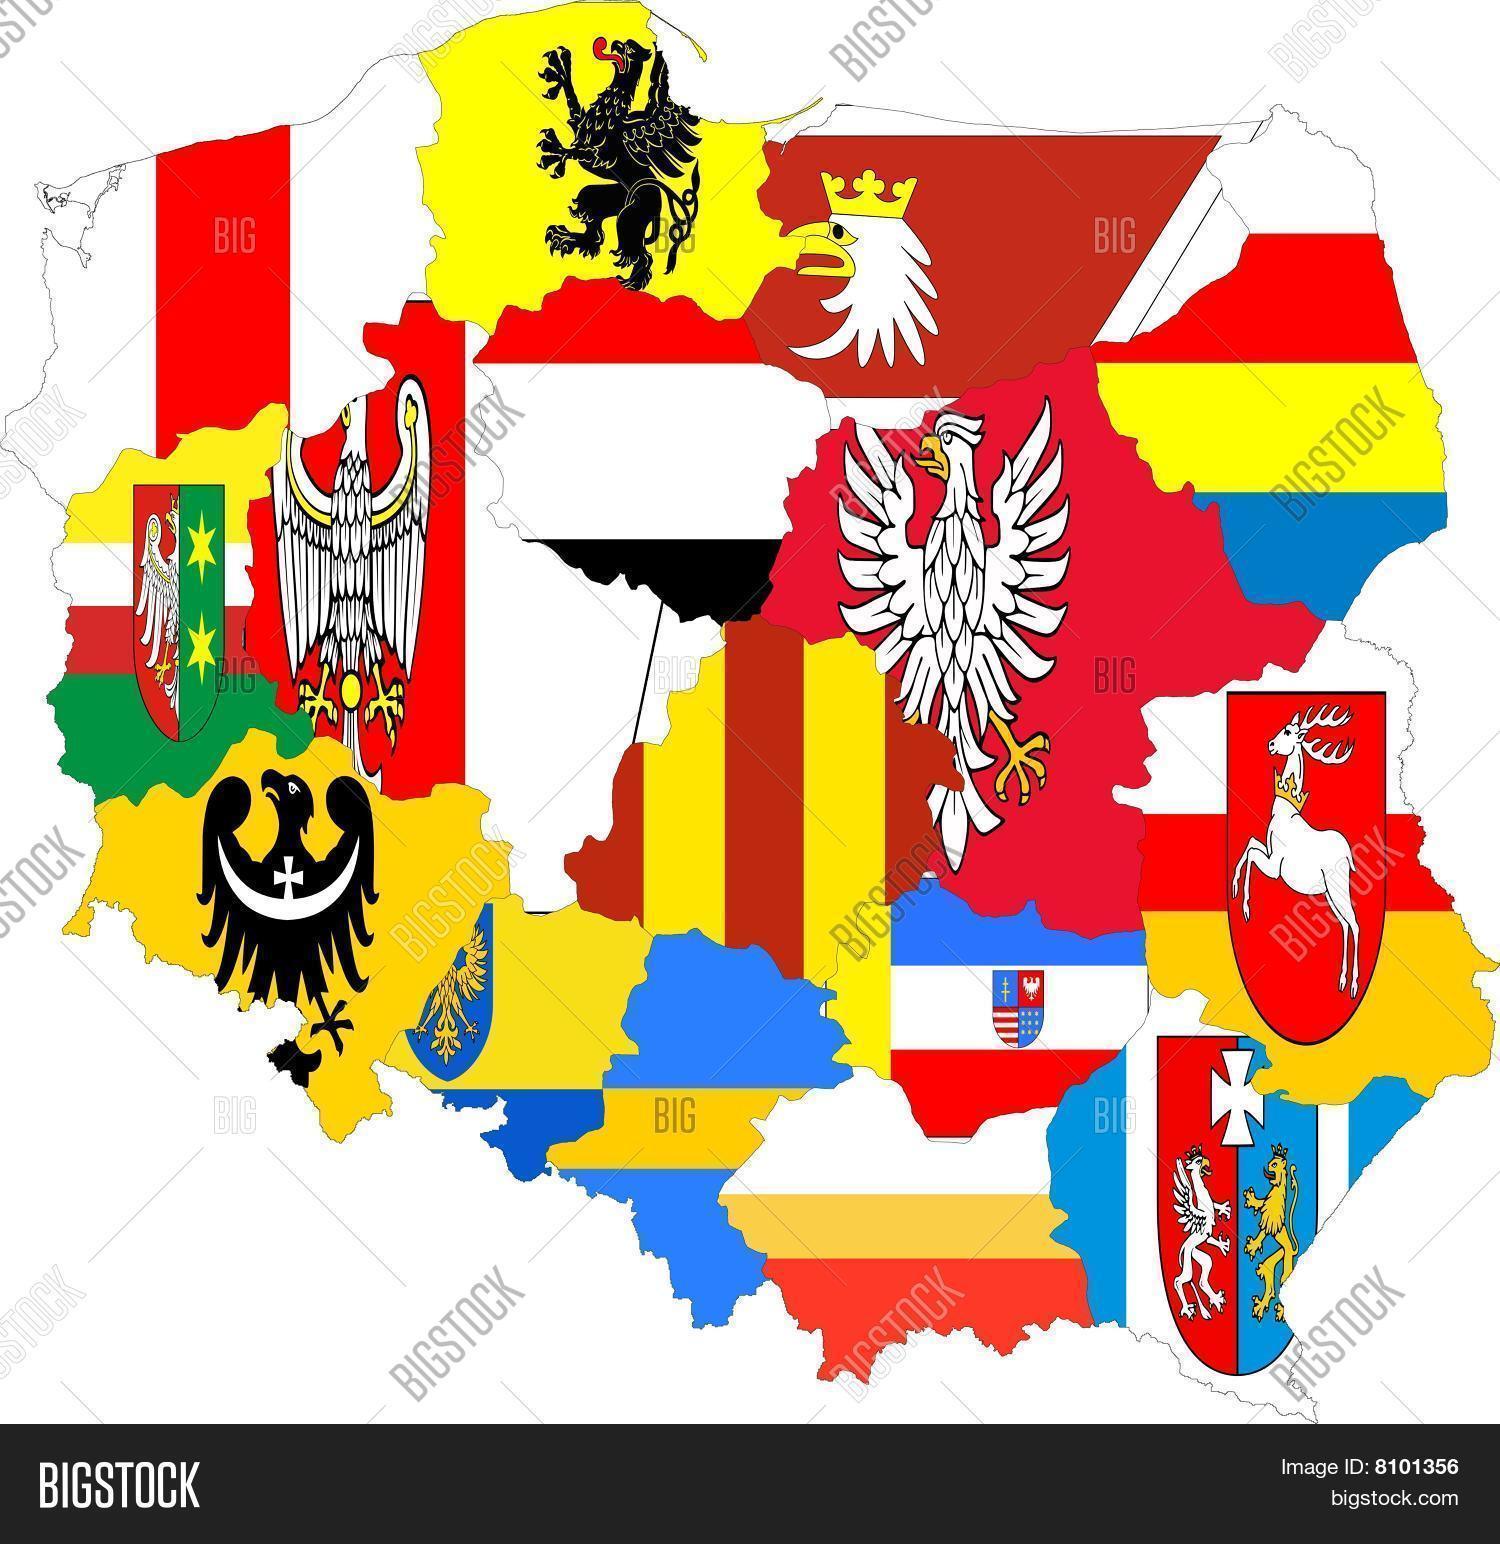 Poland Map Provinces Image & Photo (Free Trial) | Bigstock